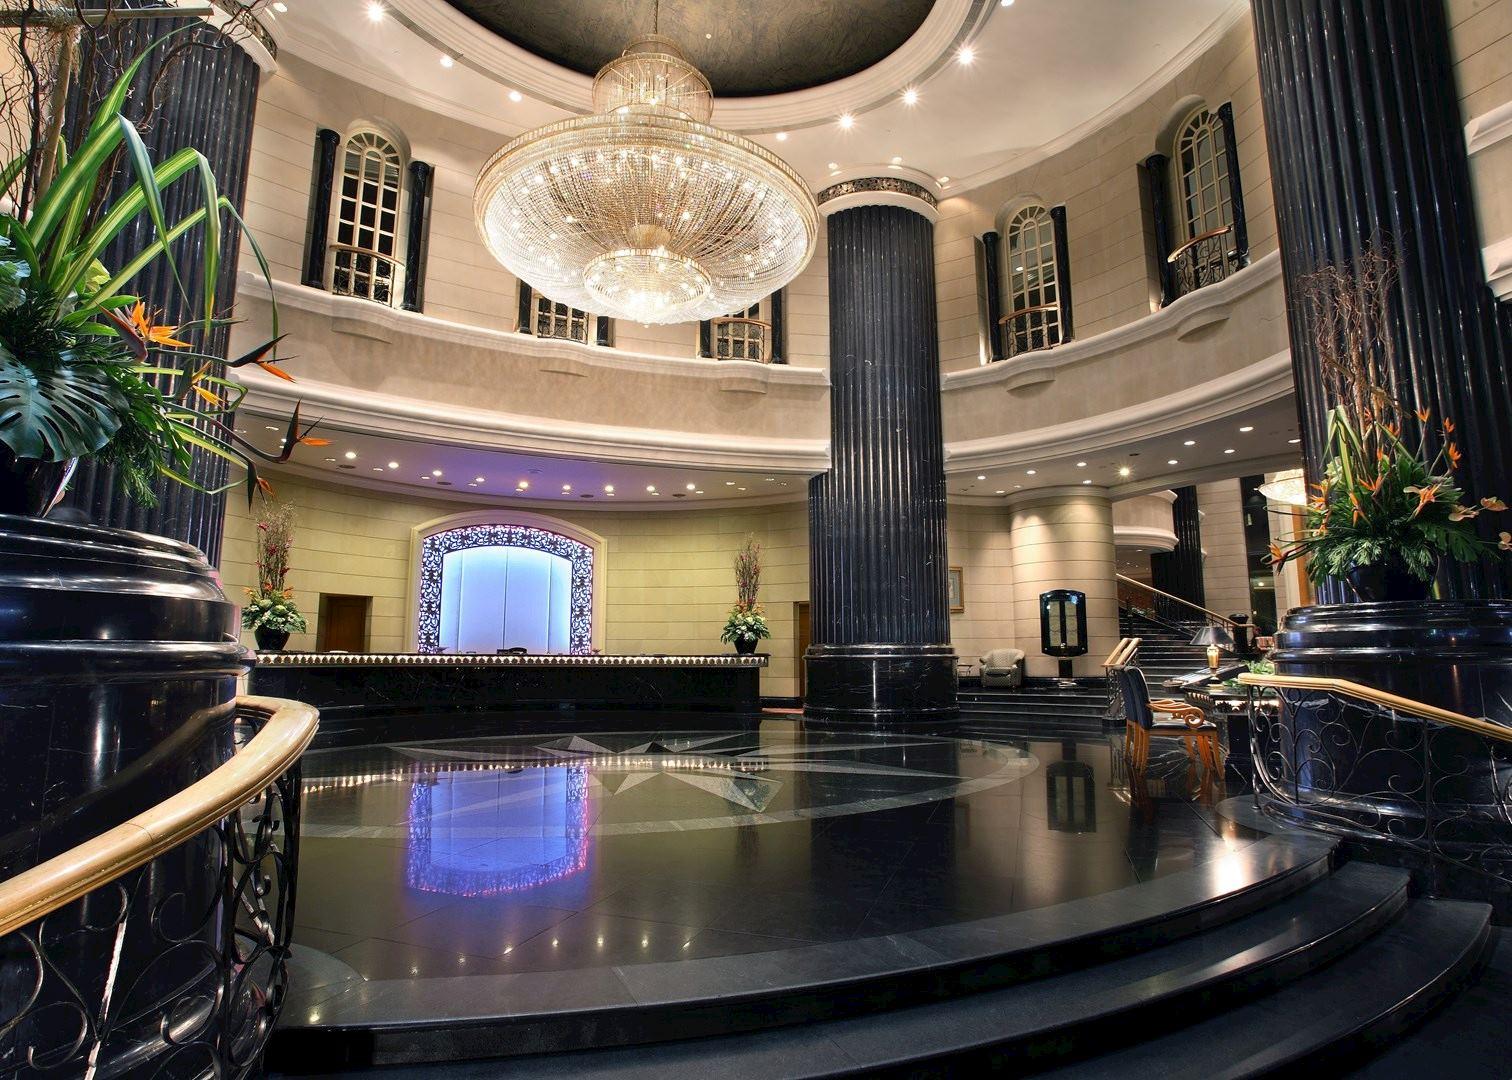 Renaissance Hotel Hotels In Kuala Lumpur Audley Travel